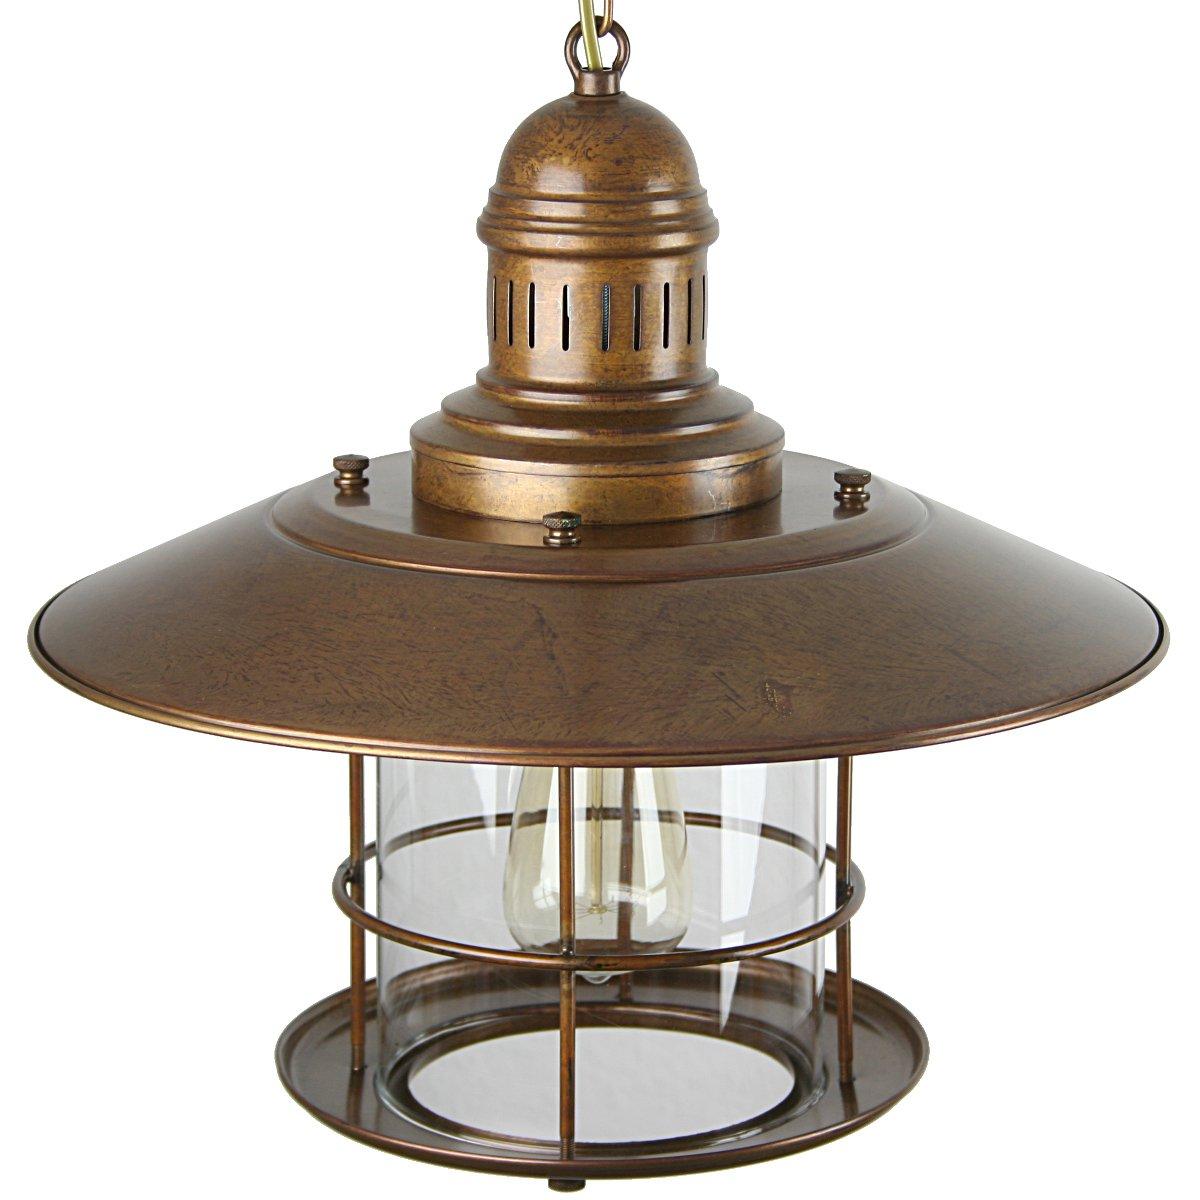 rustikale messing laterne als ausgefallene wohnraumlampe g nstig kaufen bei lampen suntinger shop. Black Bedroom Furniture Sets. Home Design Ideas